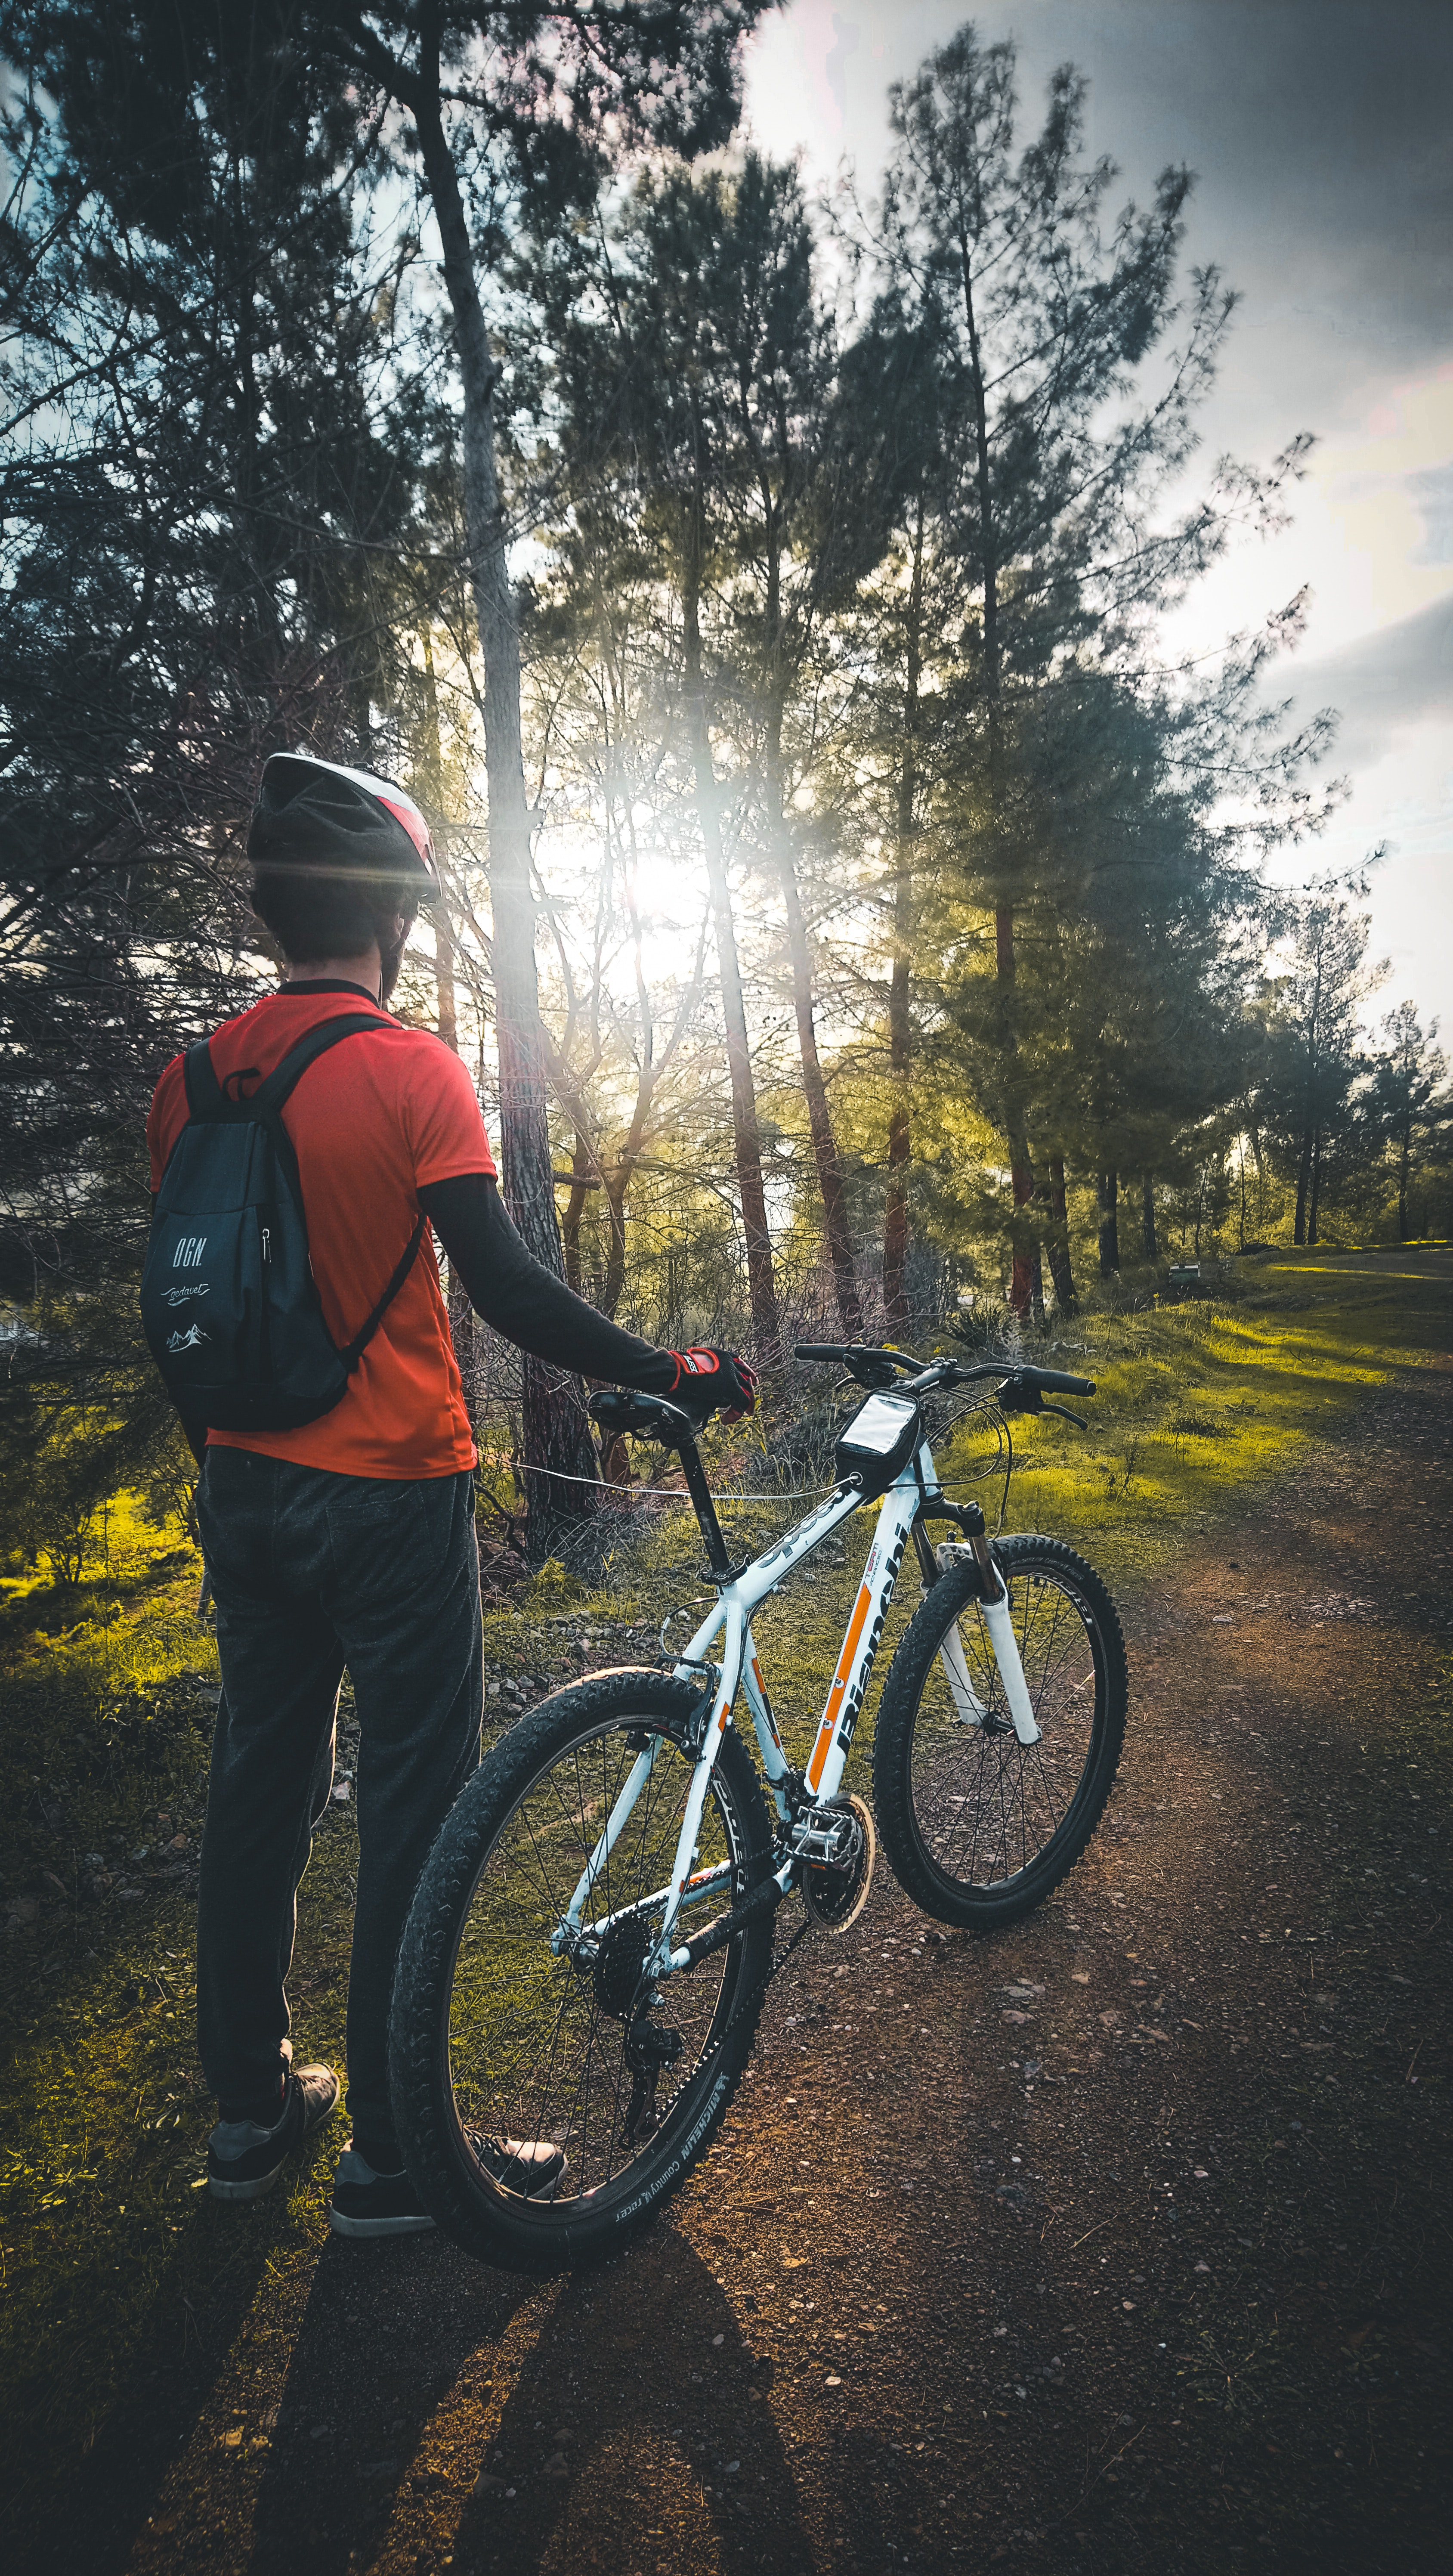 Photo of Man Wearing Red Shirt Holding White Mountain Bike, Adventure, Nature, Wear, Vehicle, HQ Photo